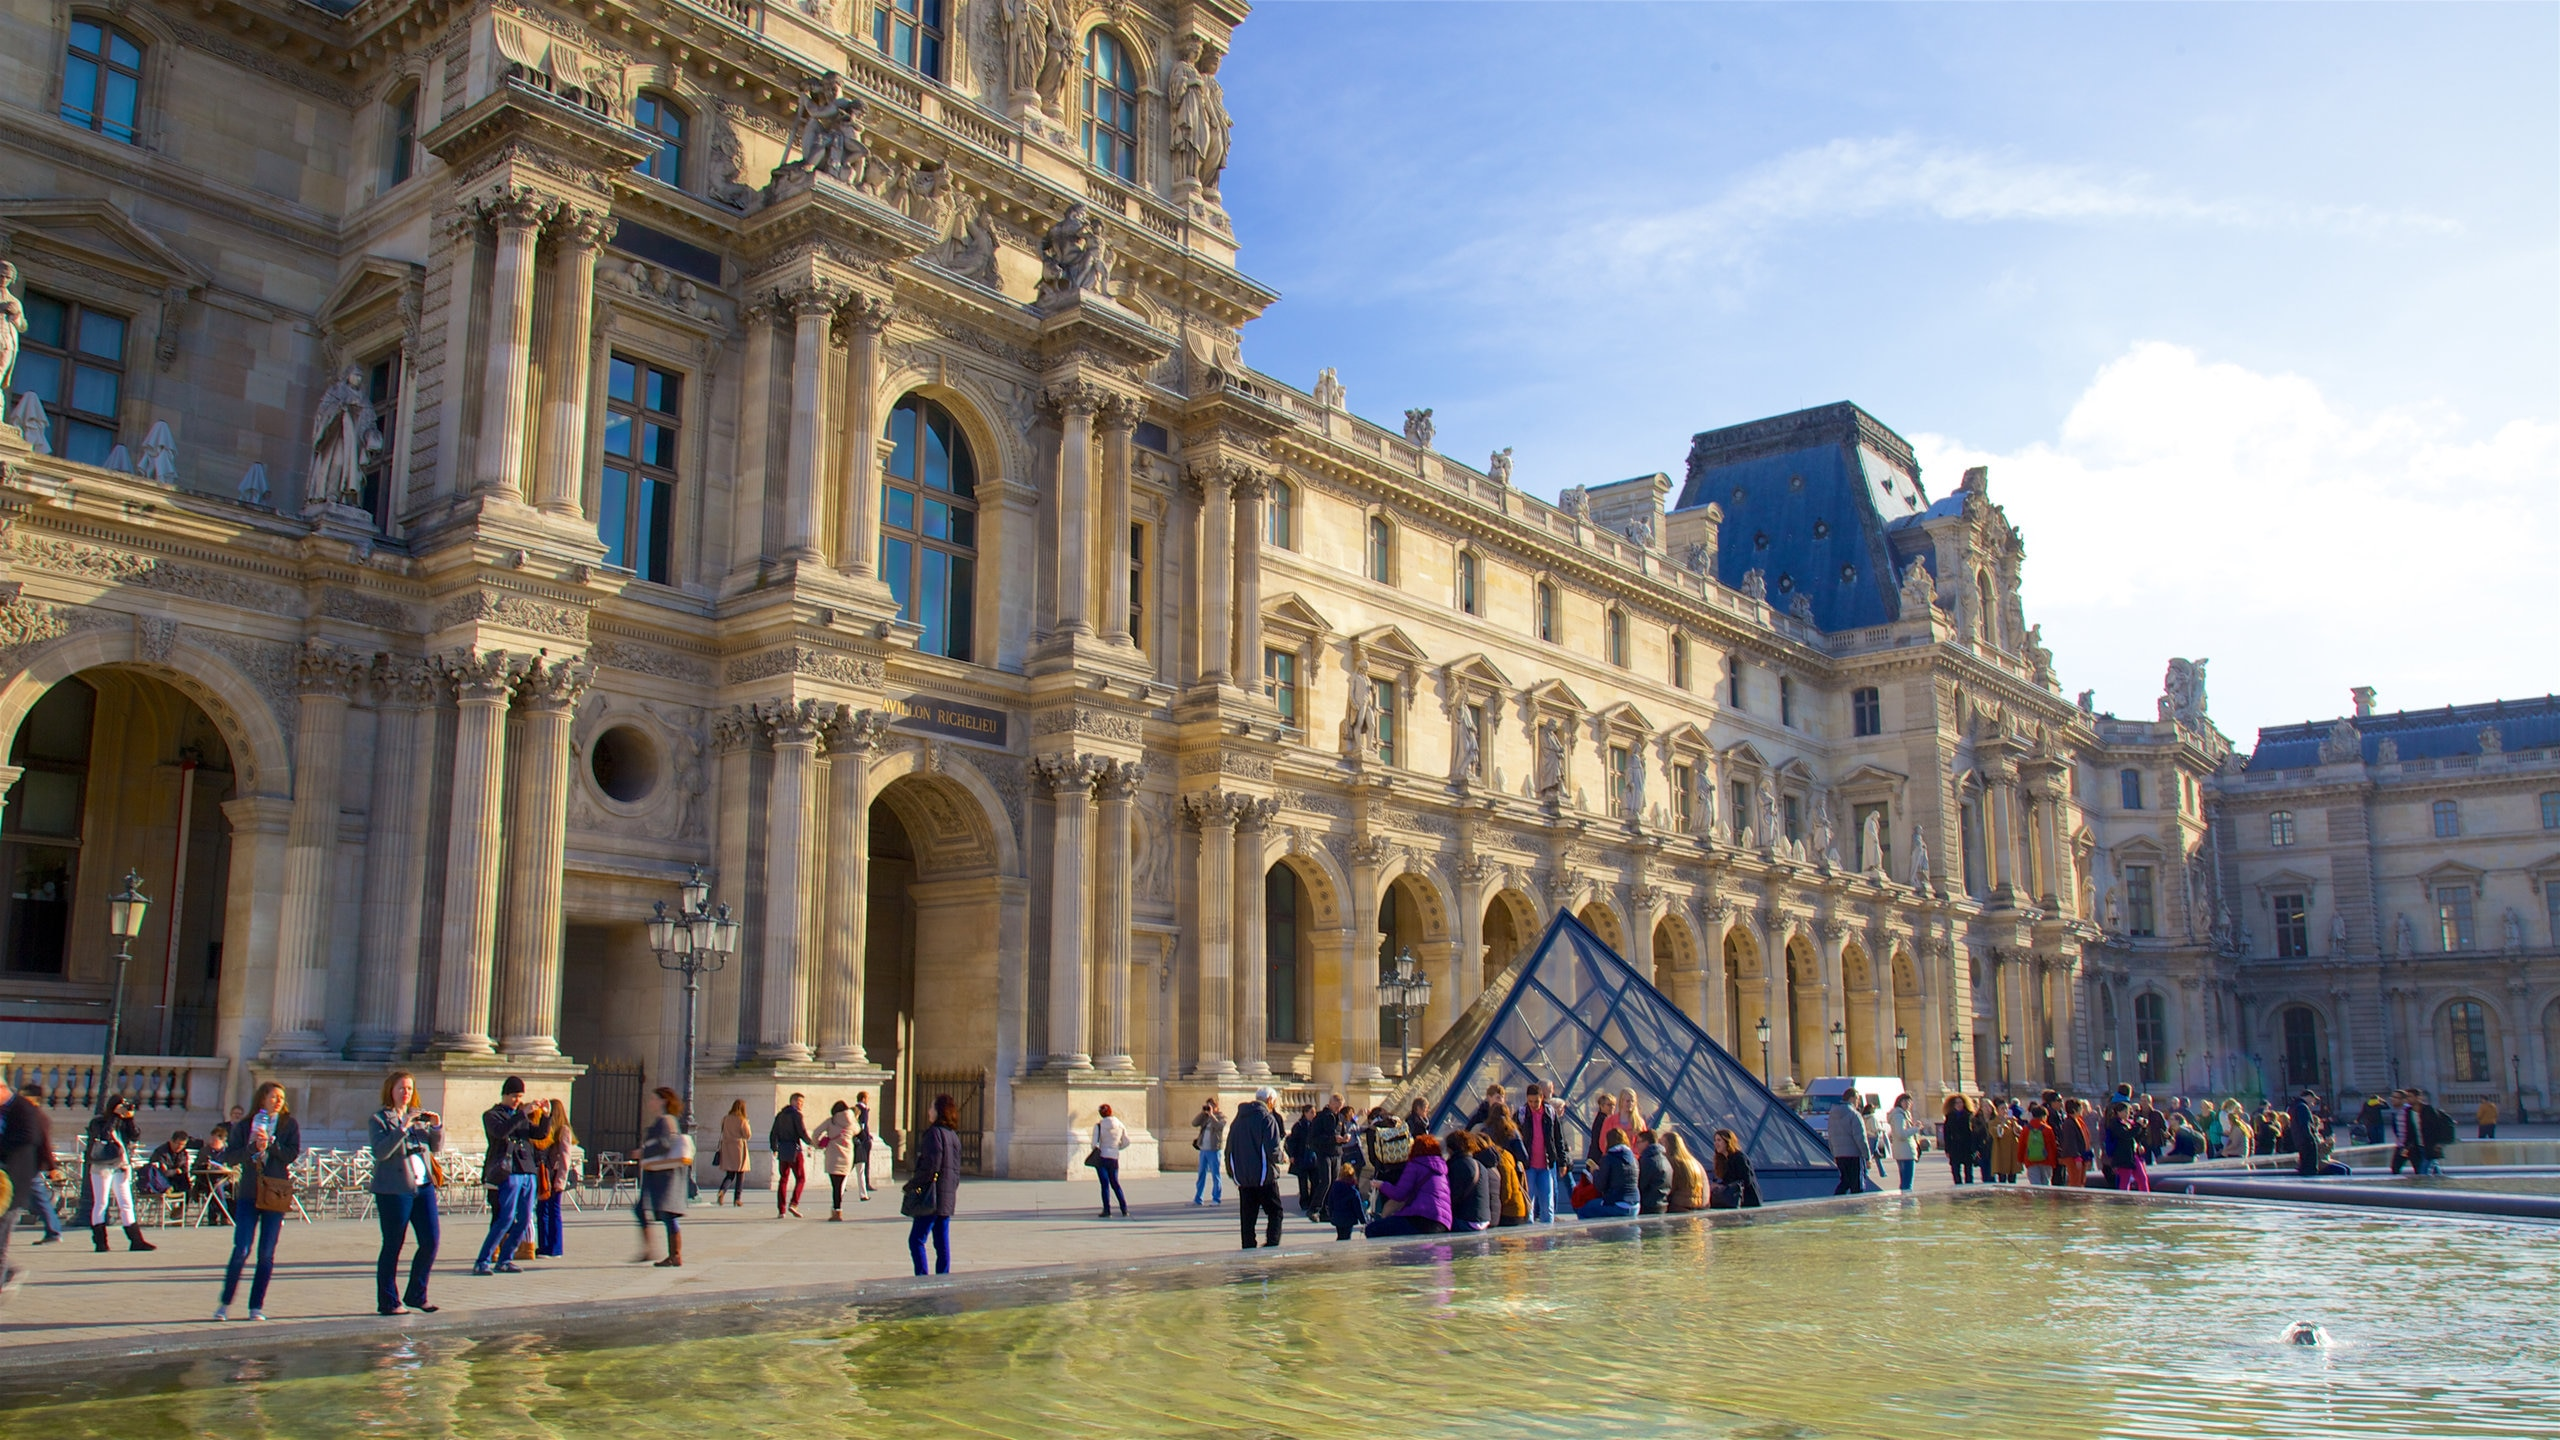 Centrum van Parijs, Parijs, Frankrijk